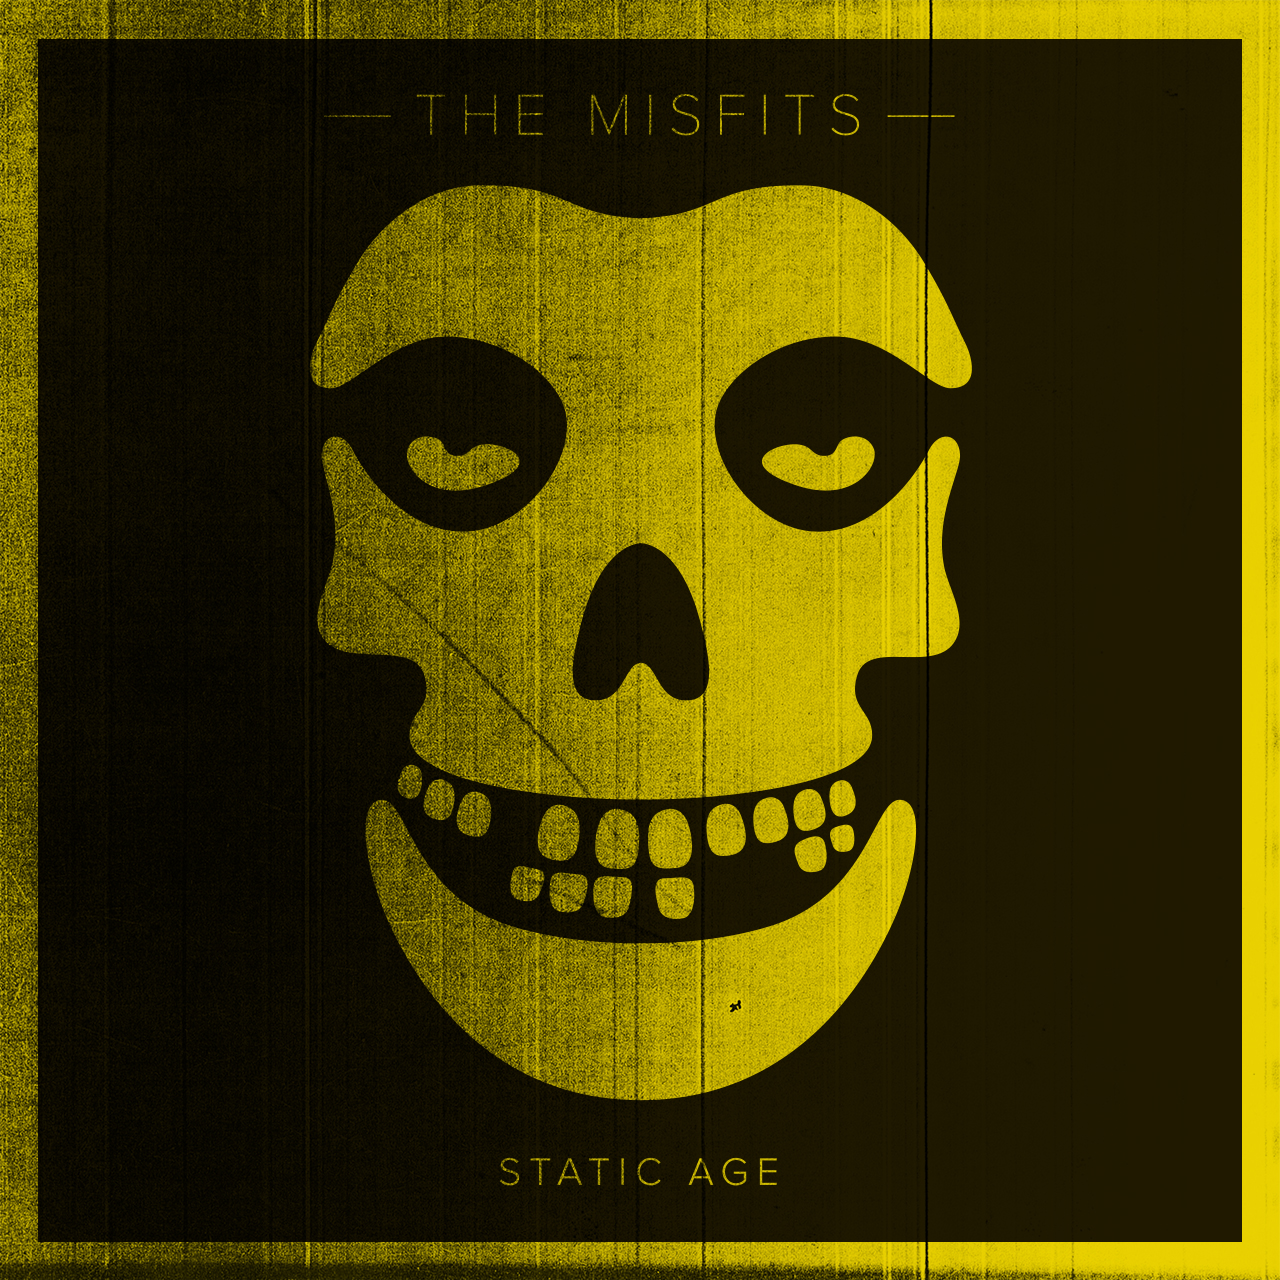 Misfits_StaticAge_1280x1280